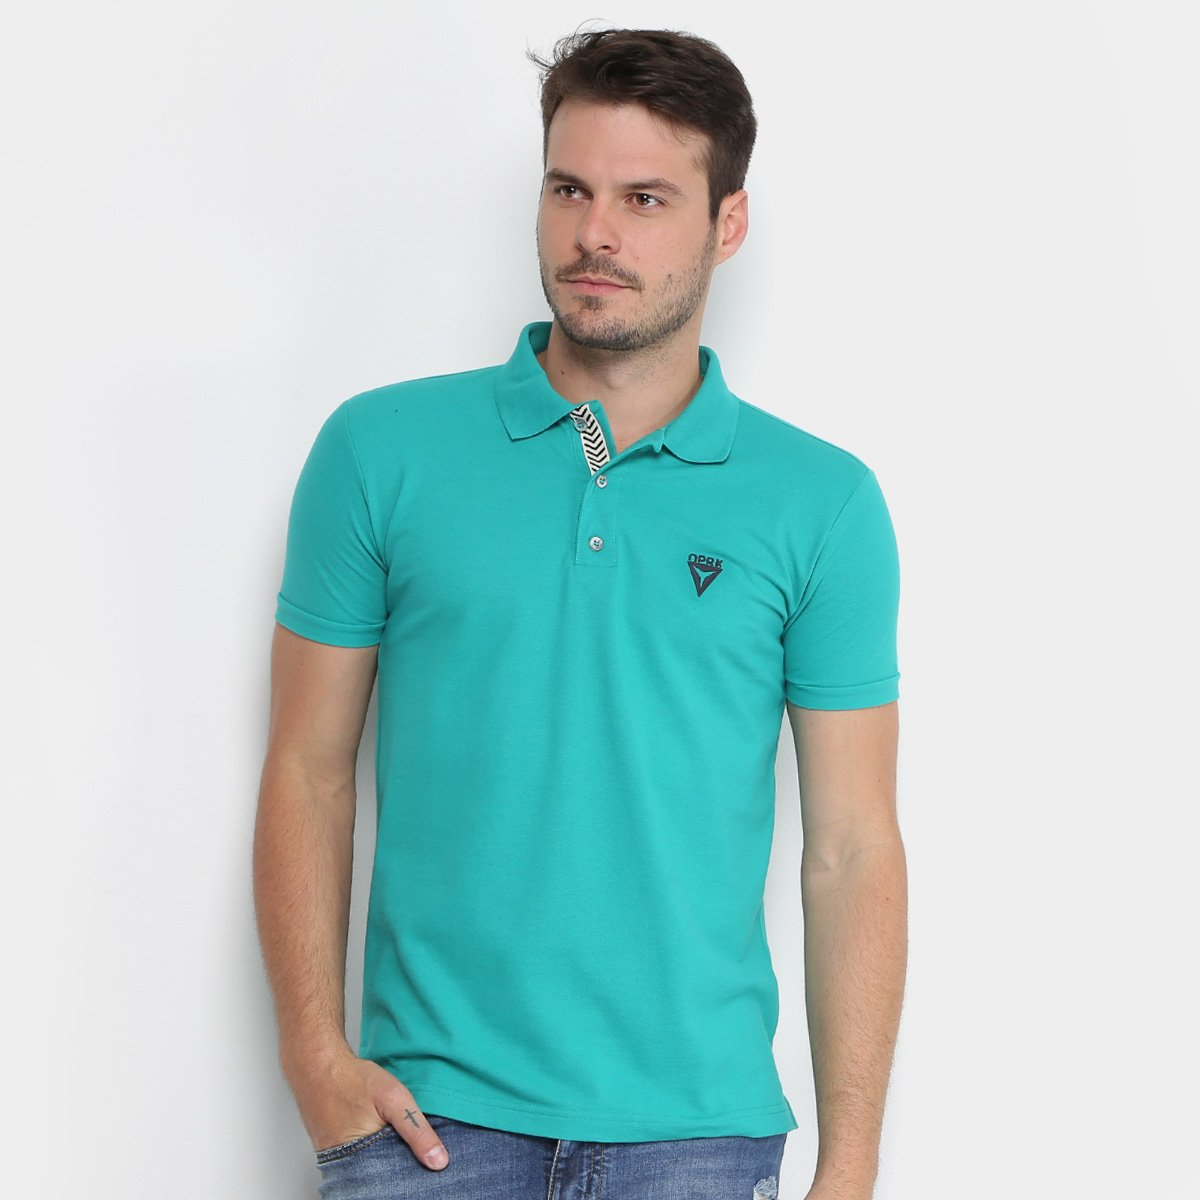 ... 7448b372e4a Camisa Polo Opera Rock Piquet Logo Bordado Masculina -  Verde . f58005def593b